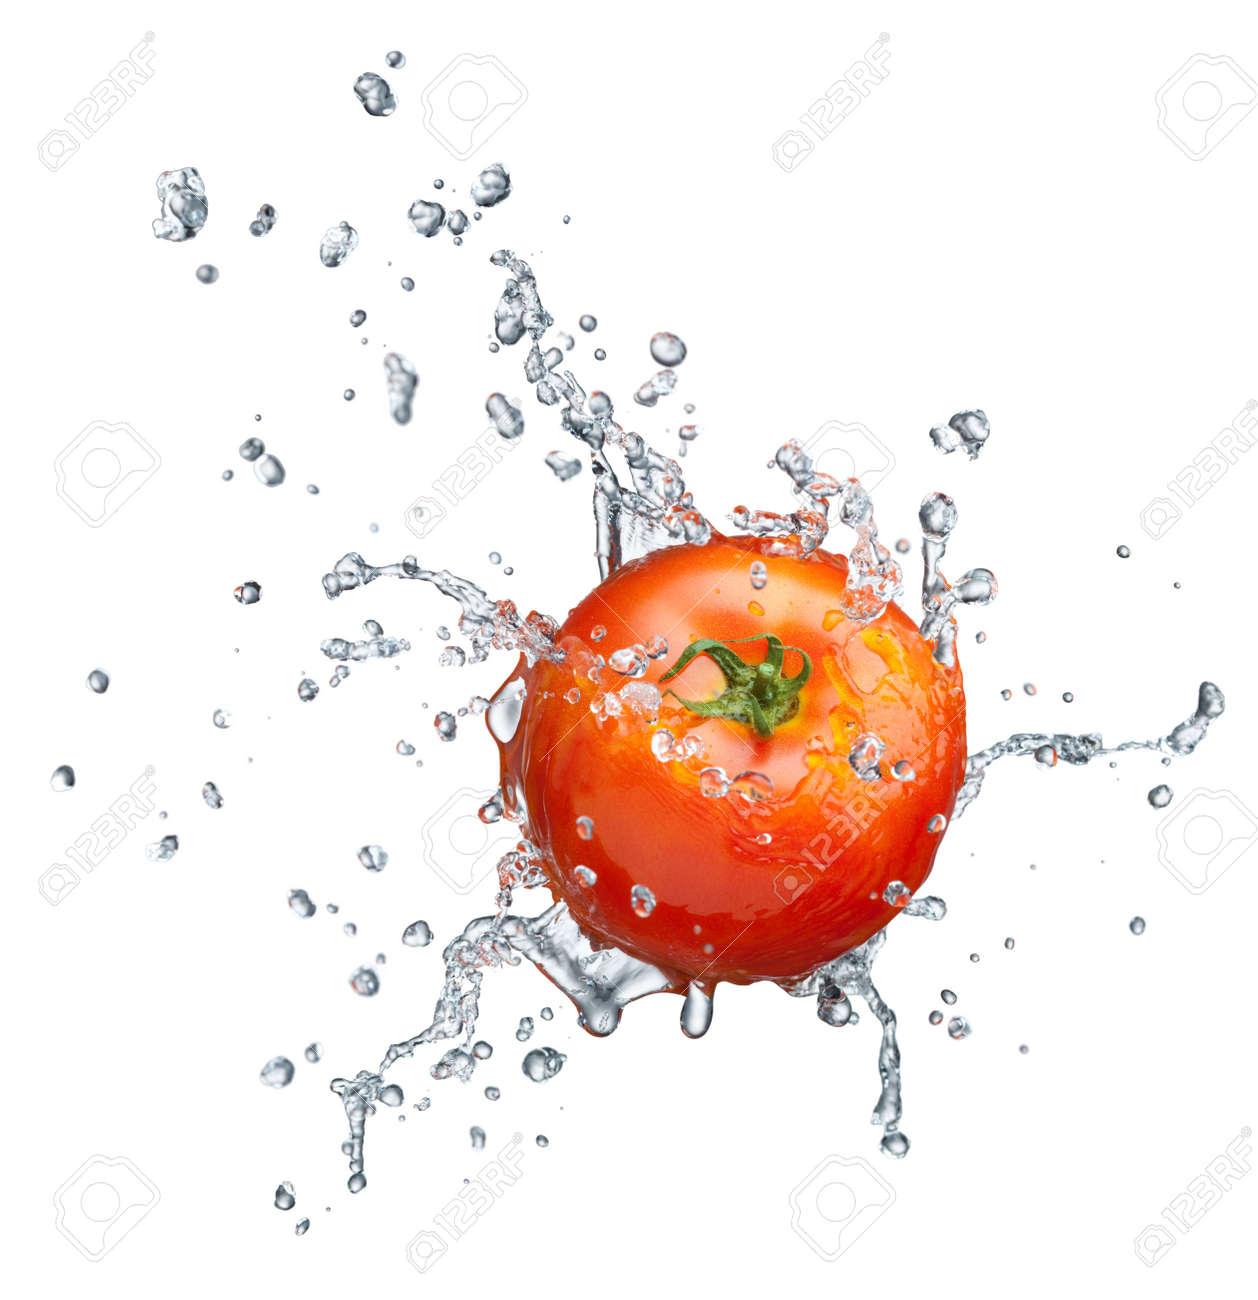 Tomato in spray of water. Juicy tomato with splash on white background Stock Photo - 7991520